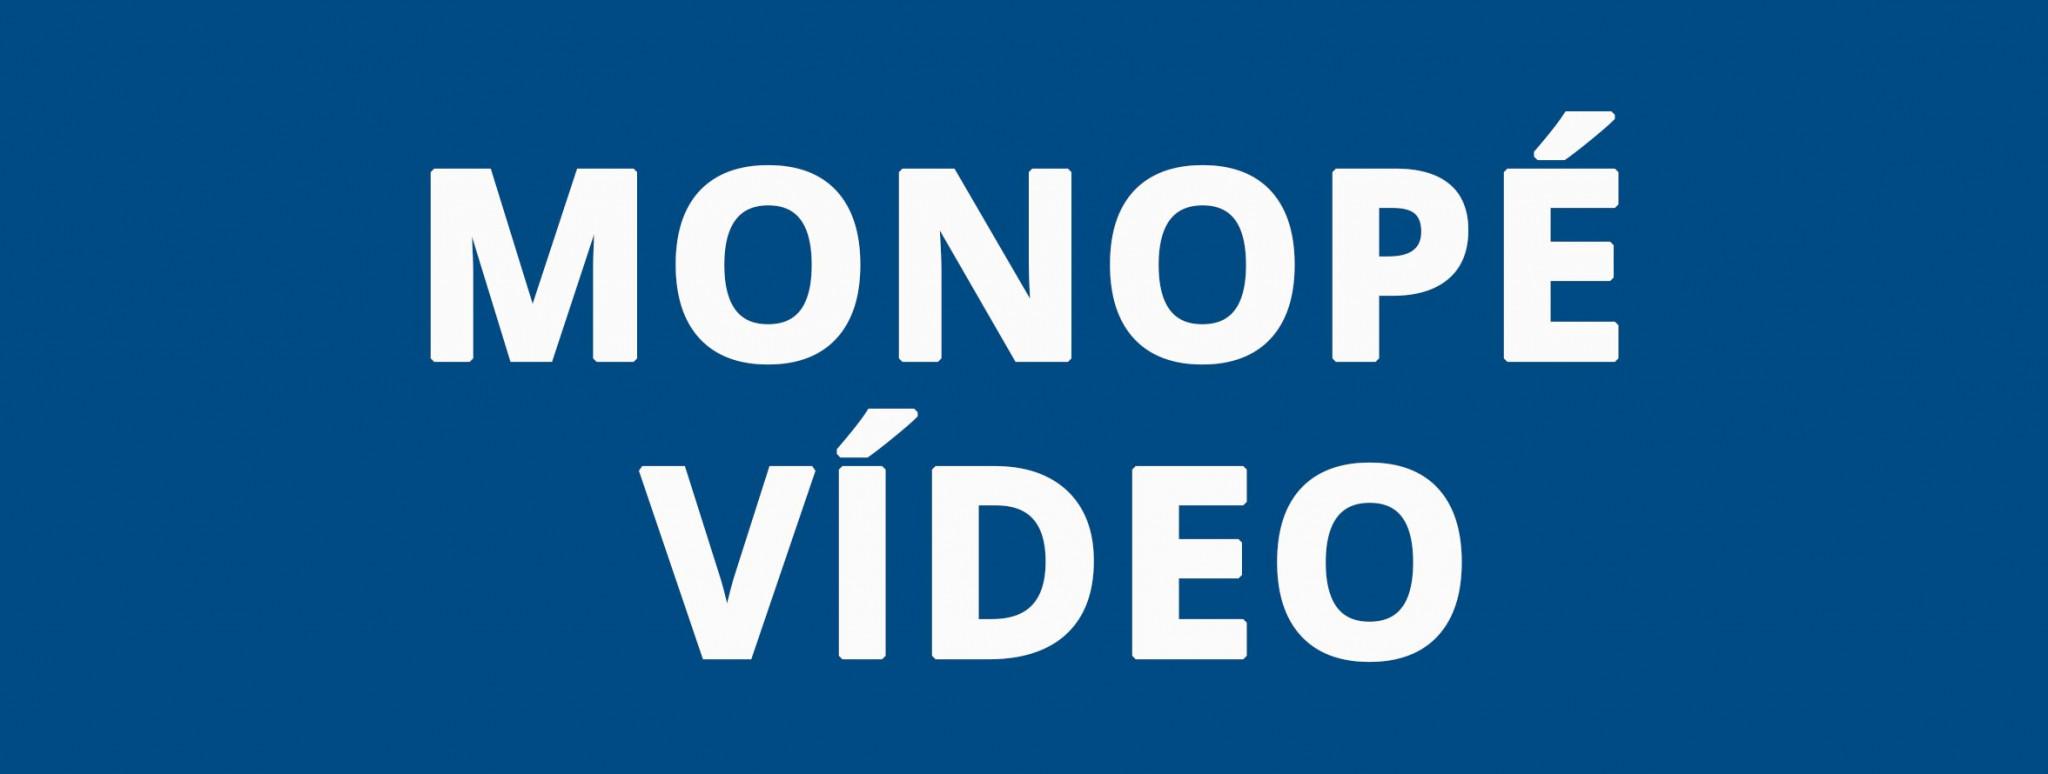 Monopé Vídeo